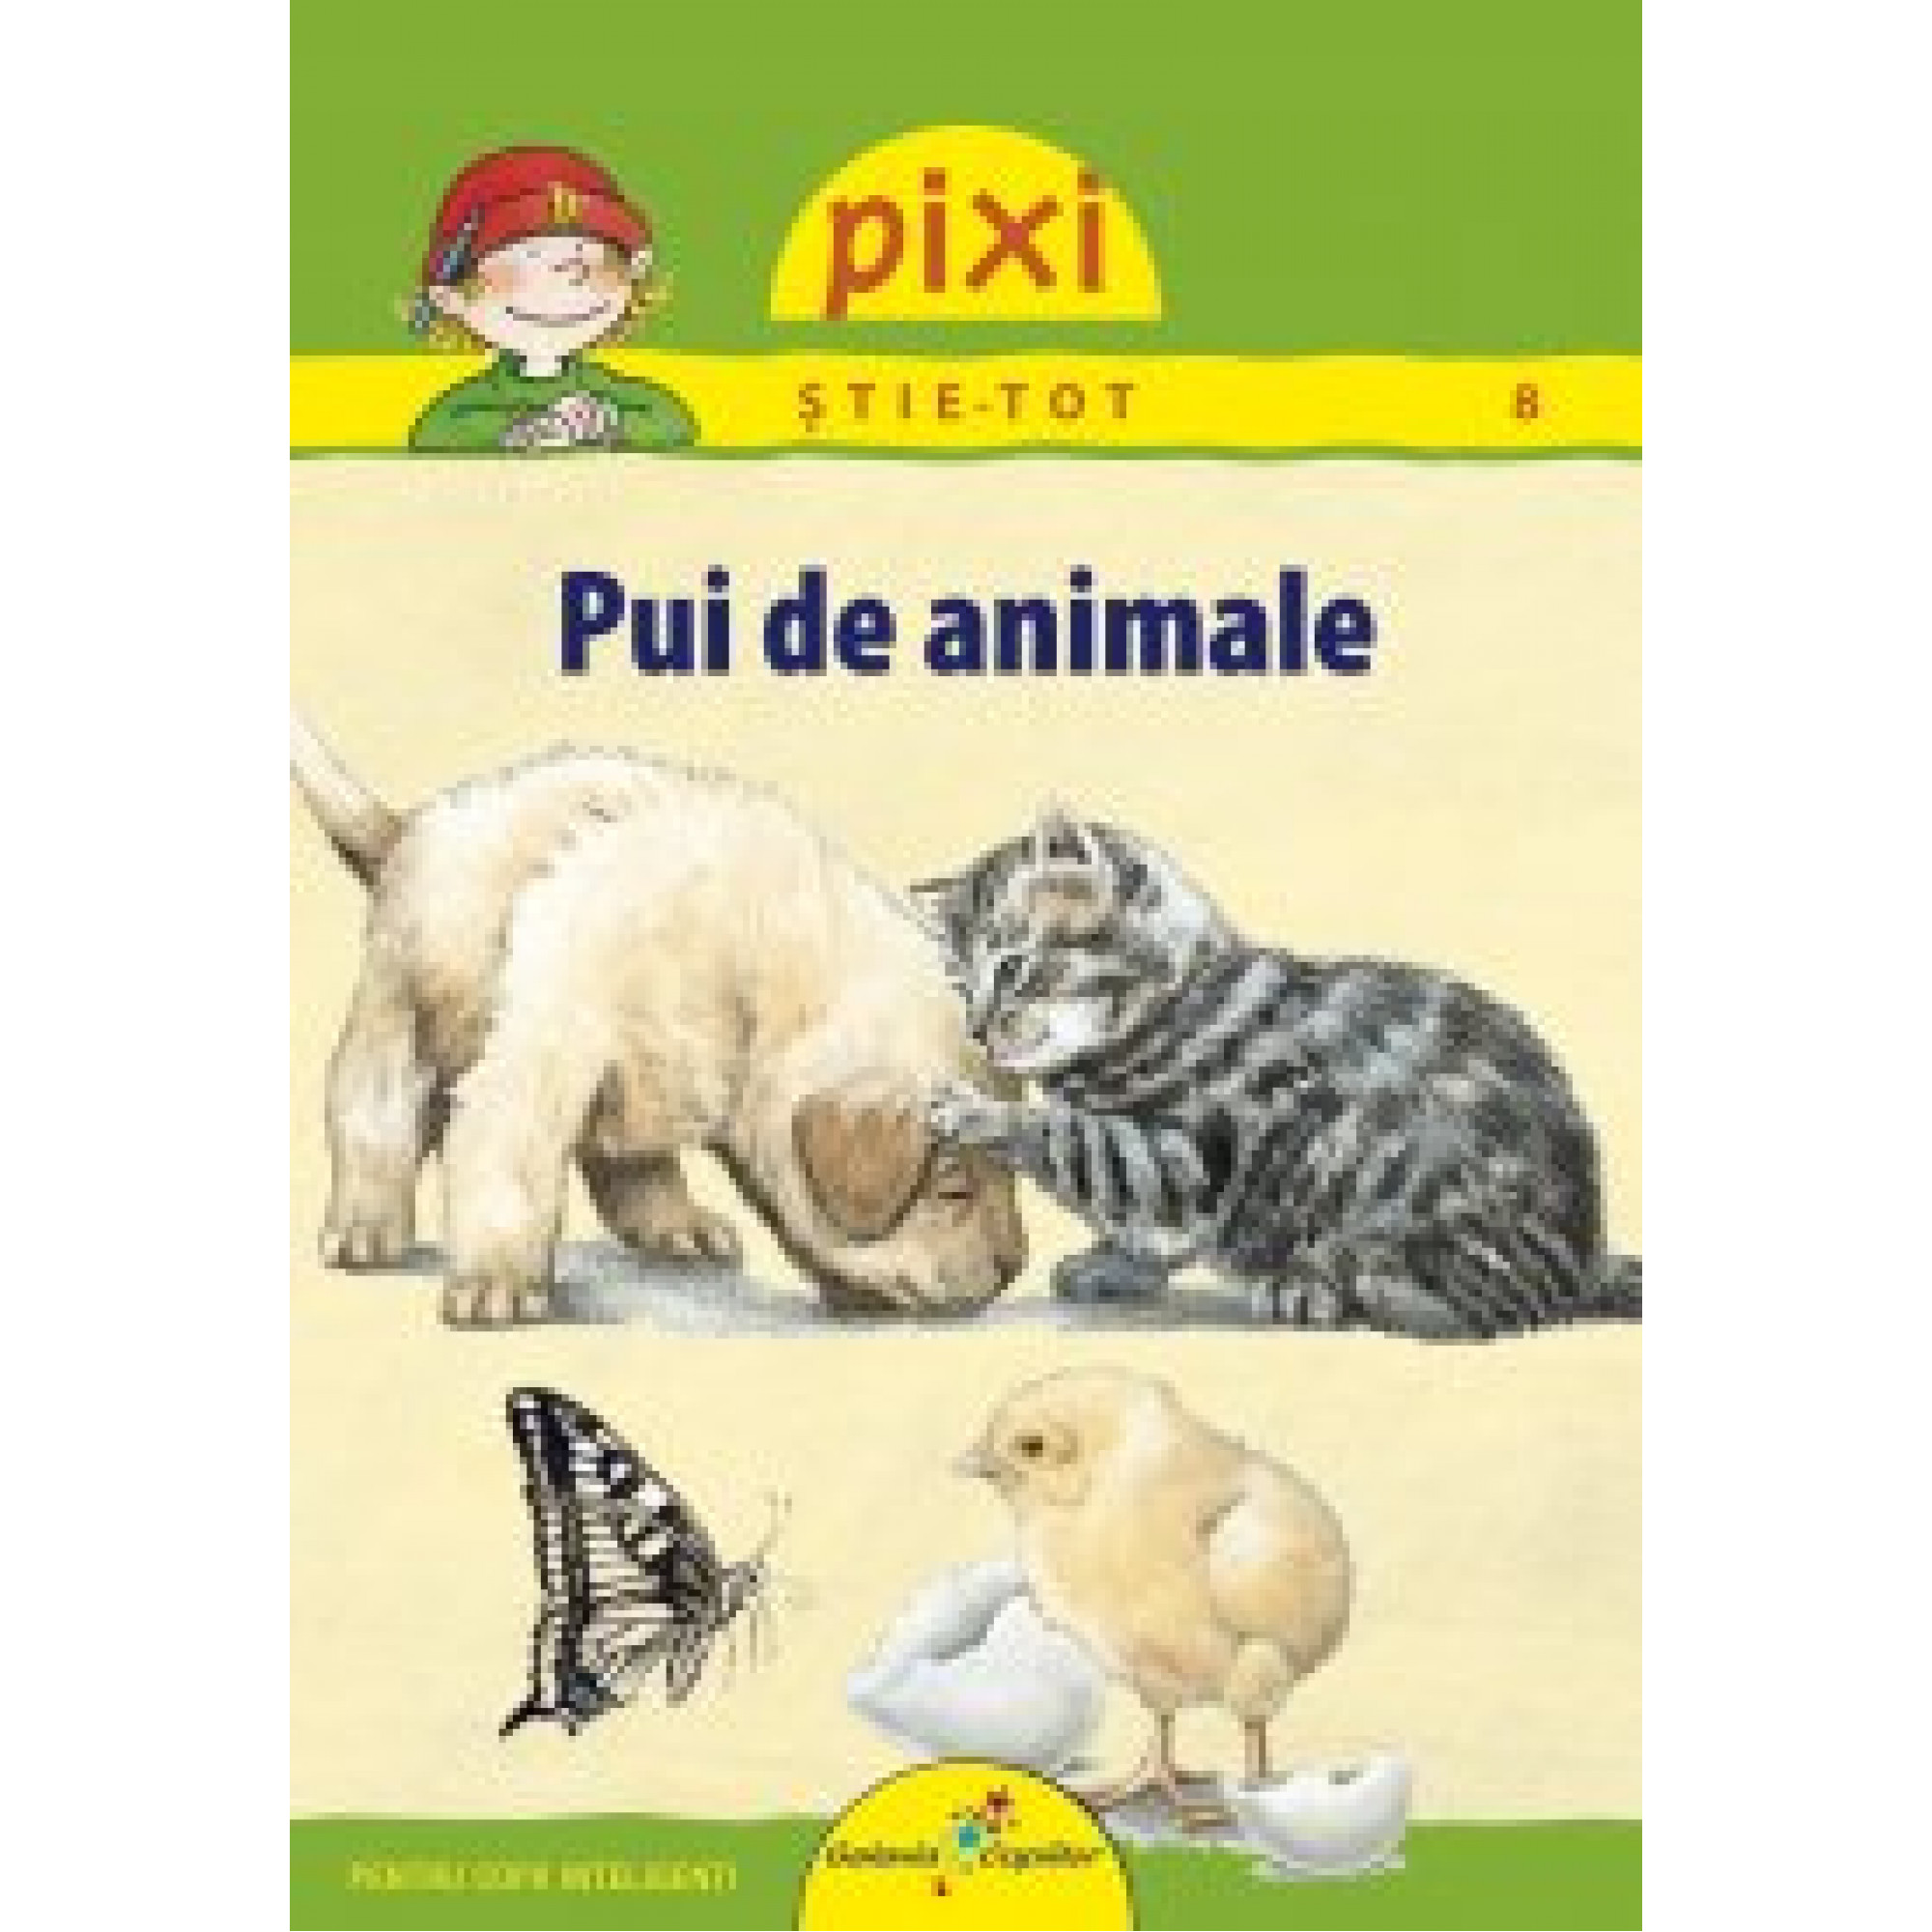 Pixi știe-tot. Pui de animale; Hanna Sörensen